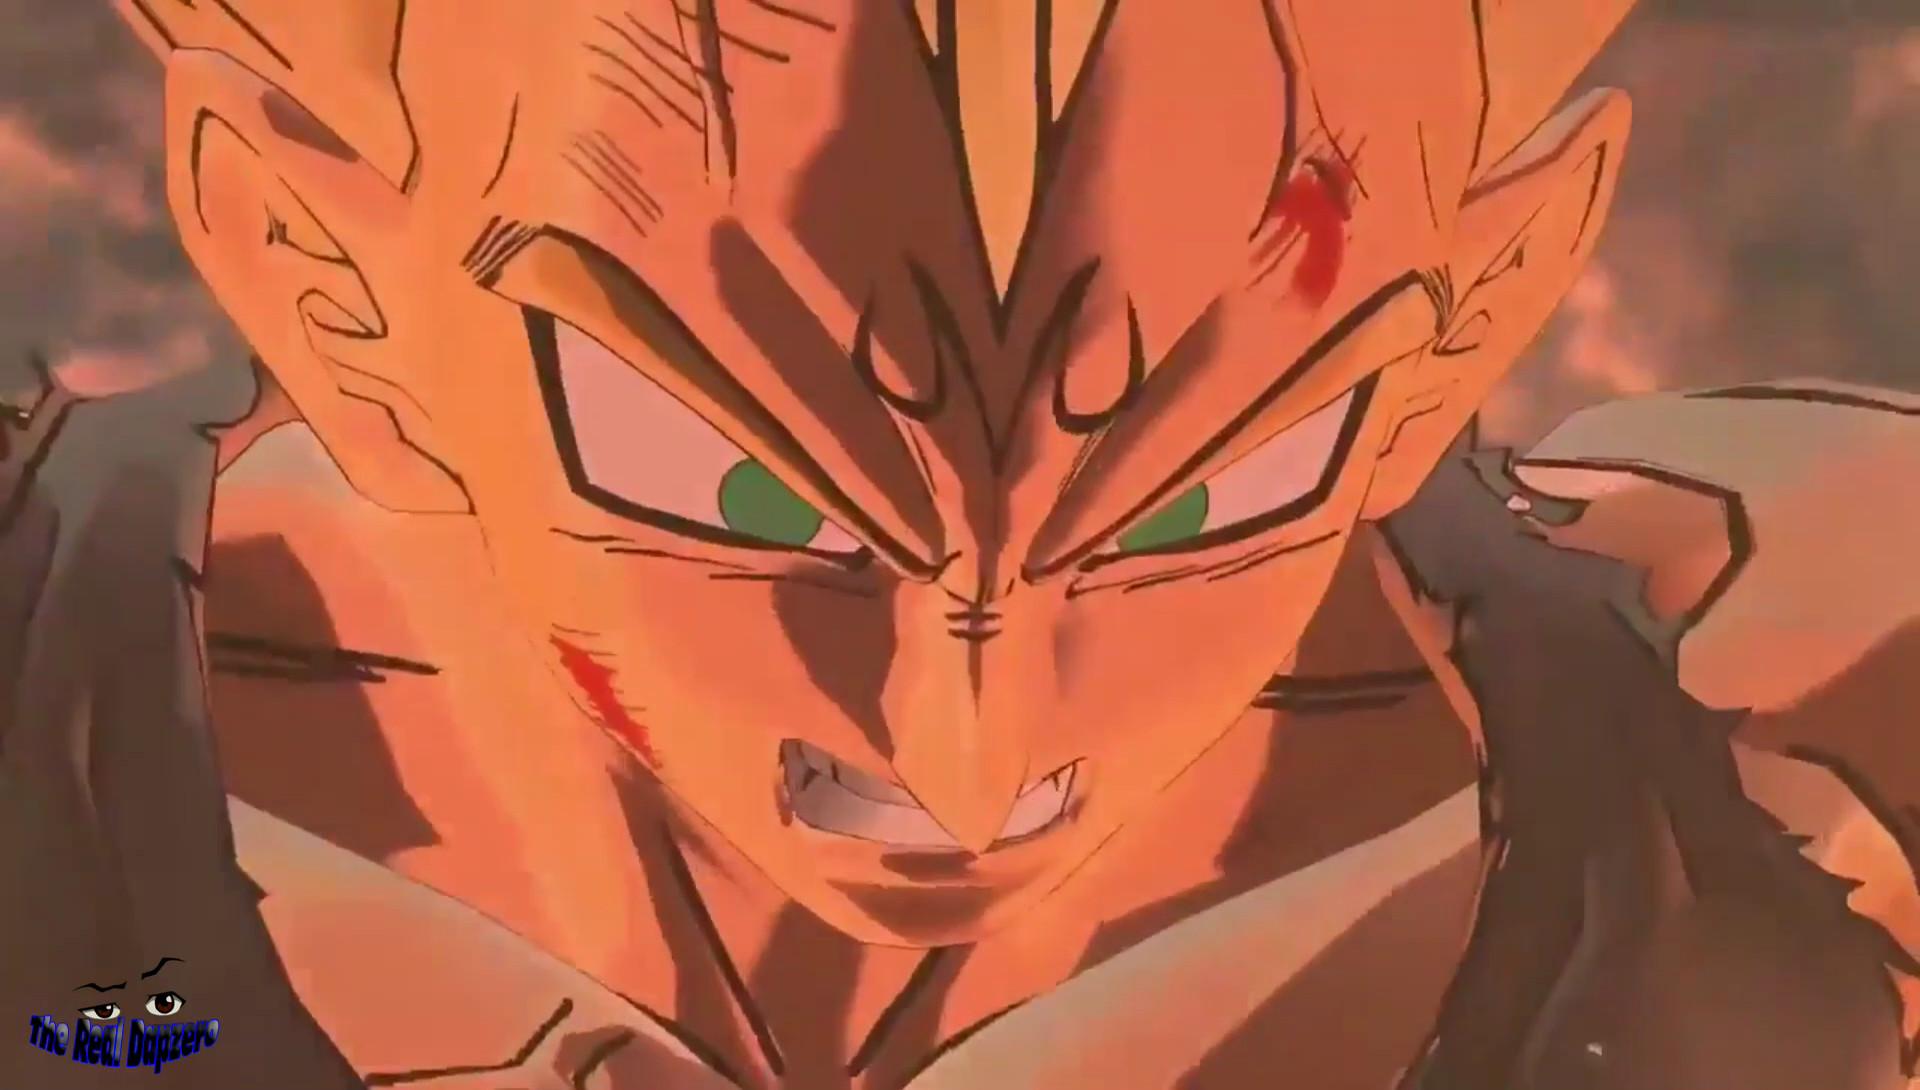 … Dragon Ball XV2 Majin Vegeta by DapzeroTRD